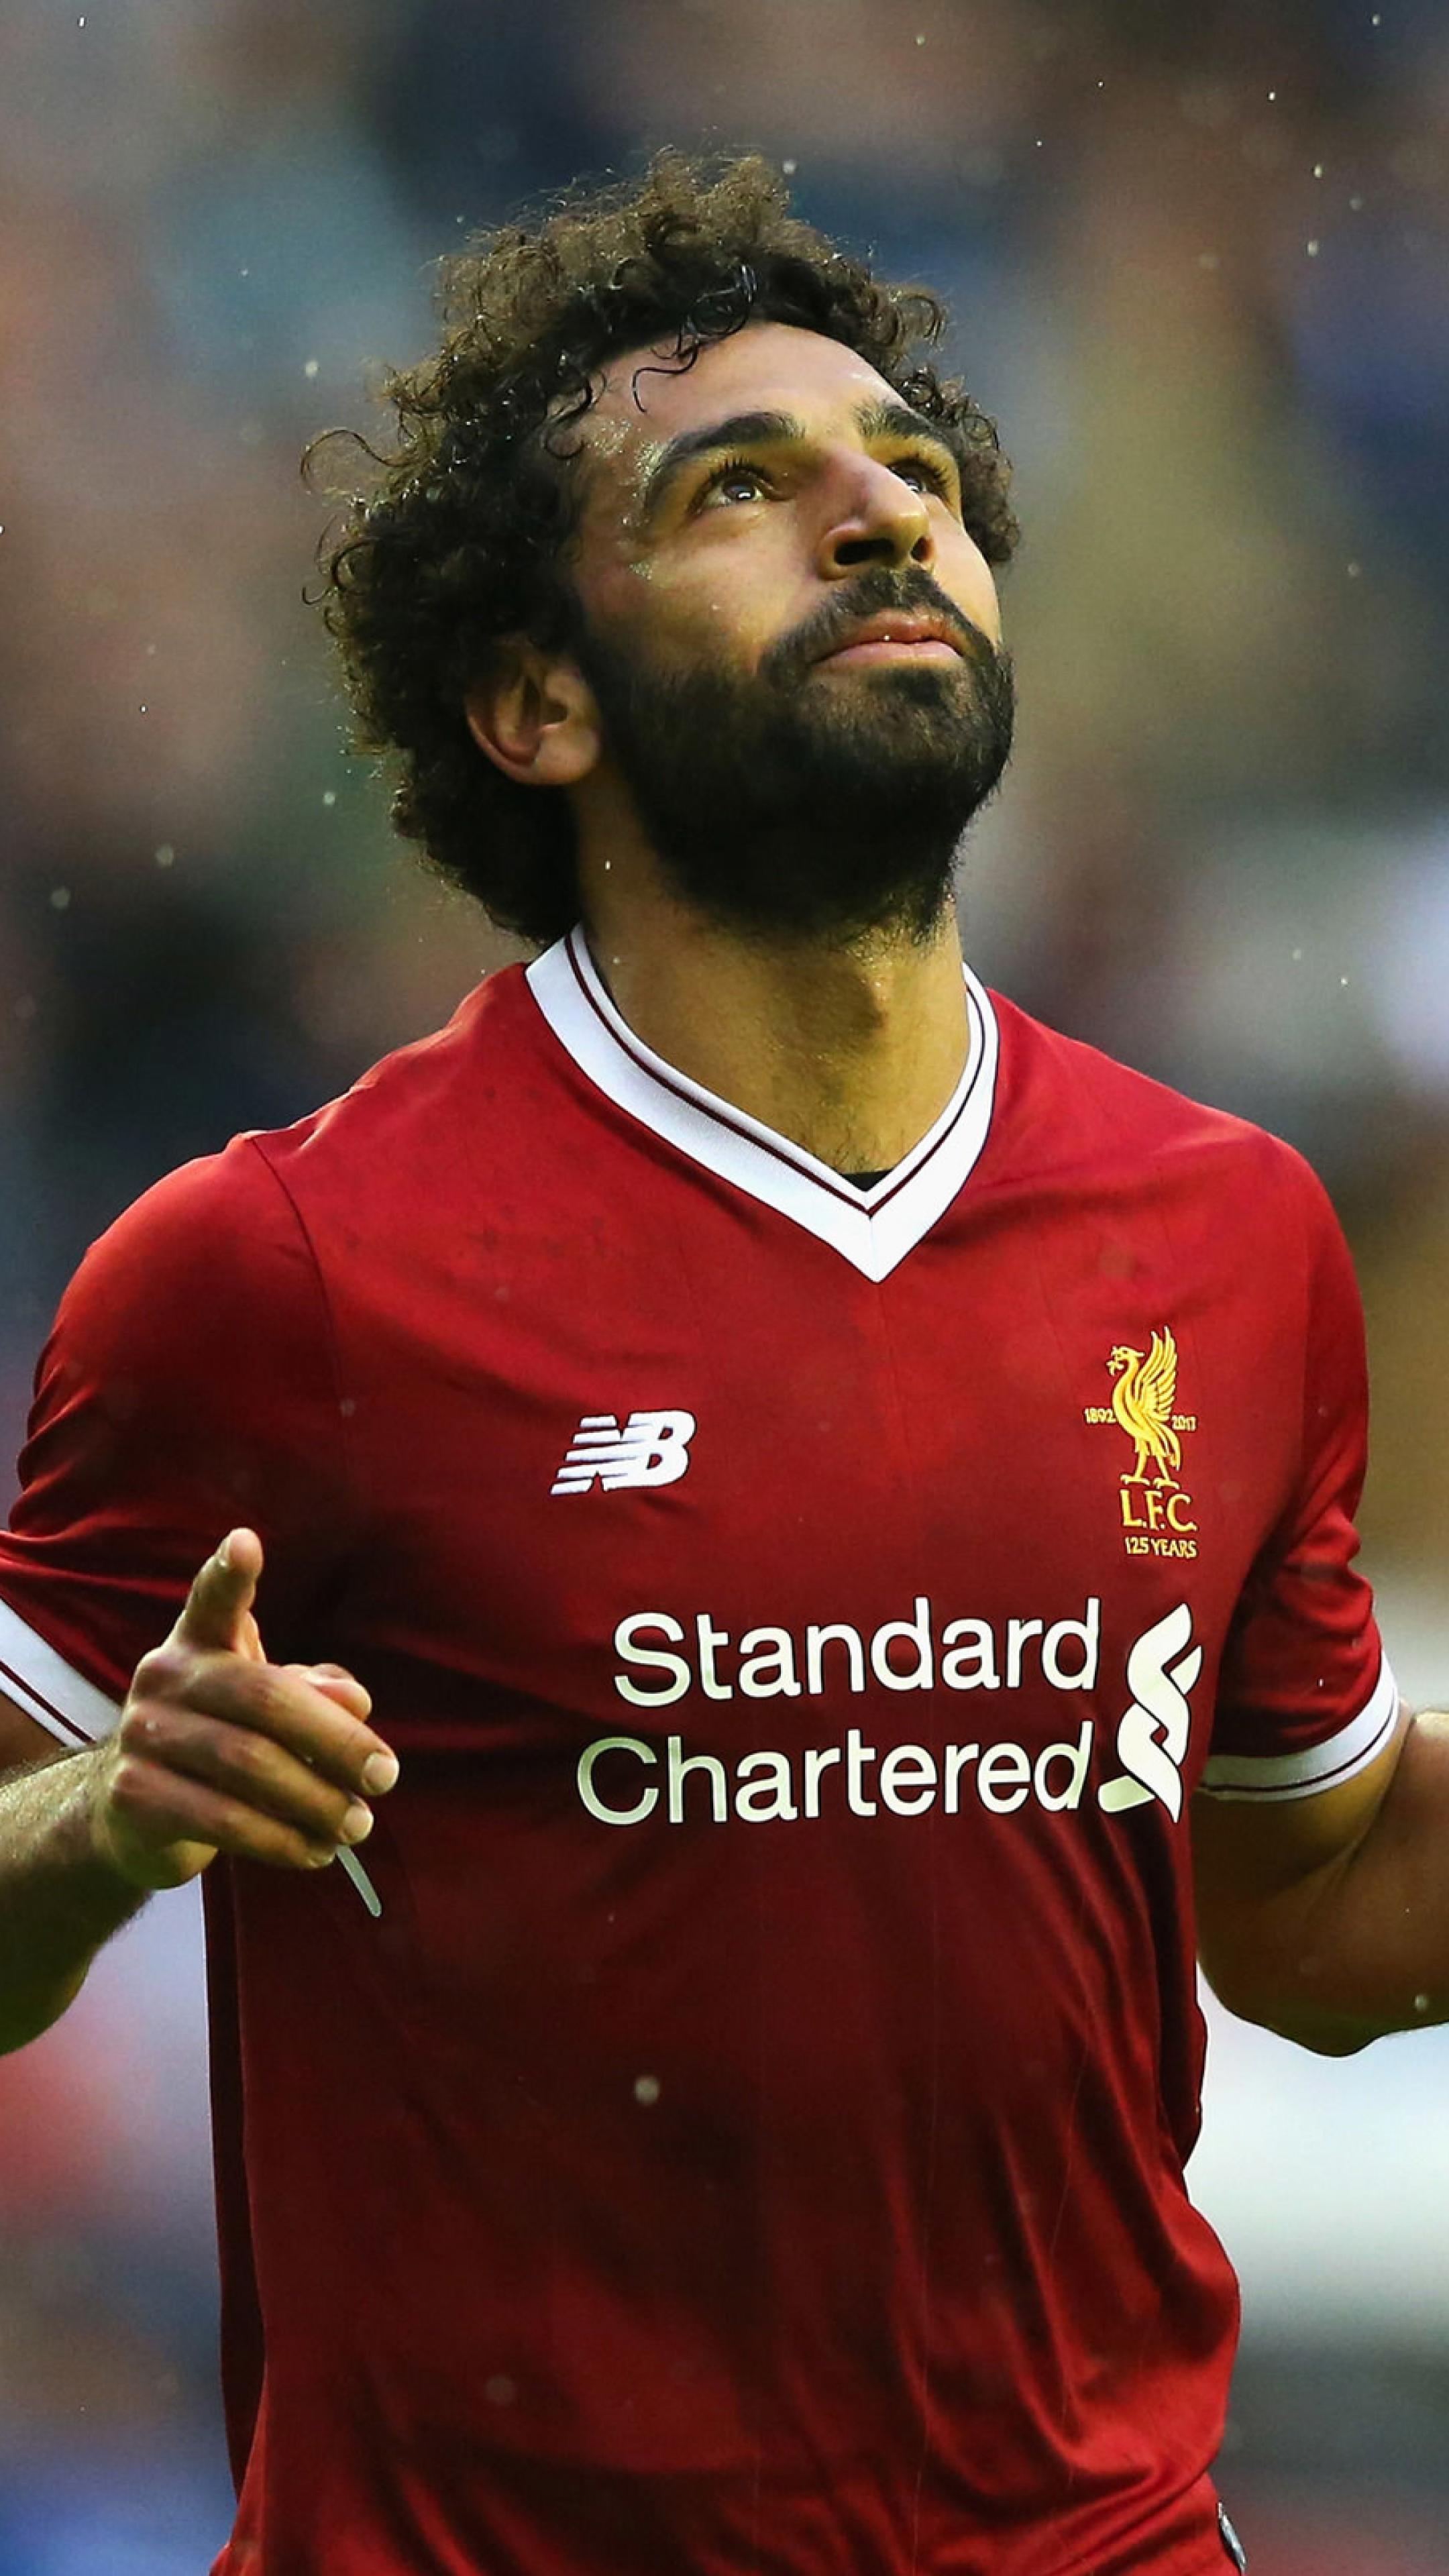 mohamed salah liverpool and egyptian football player full